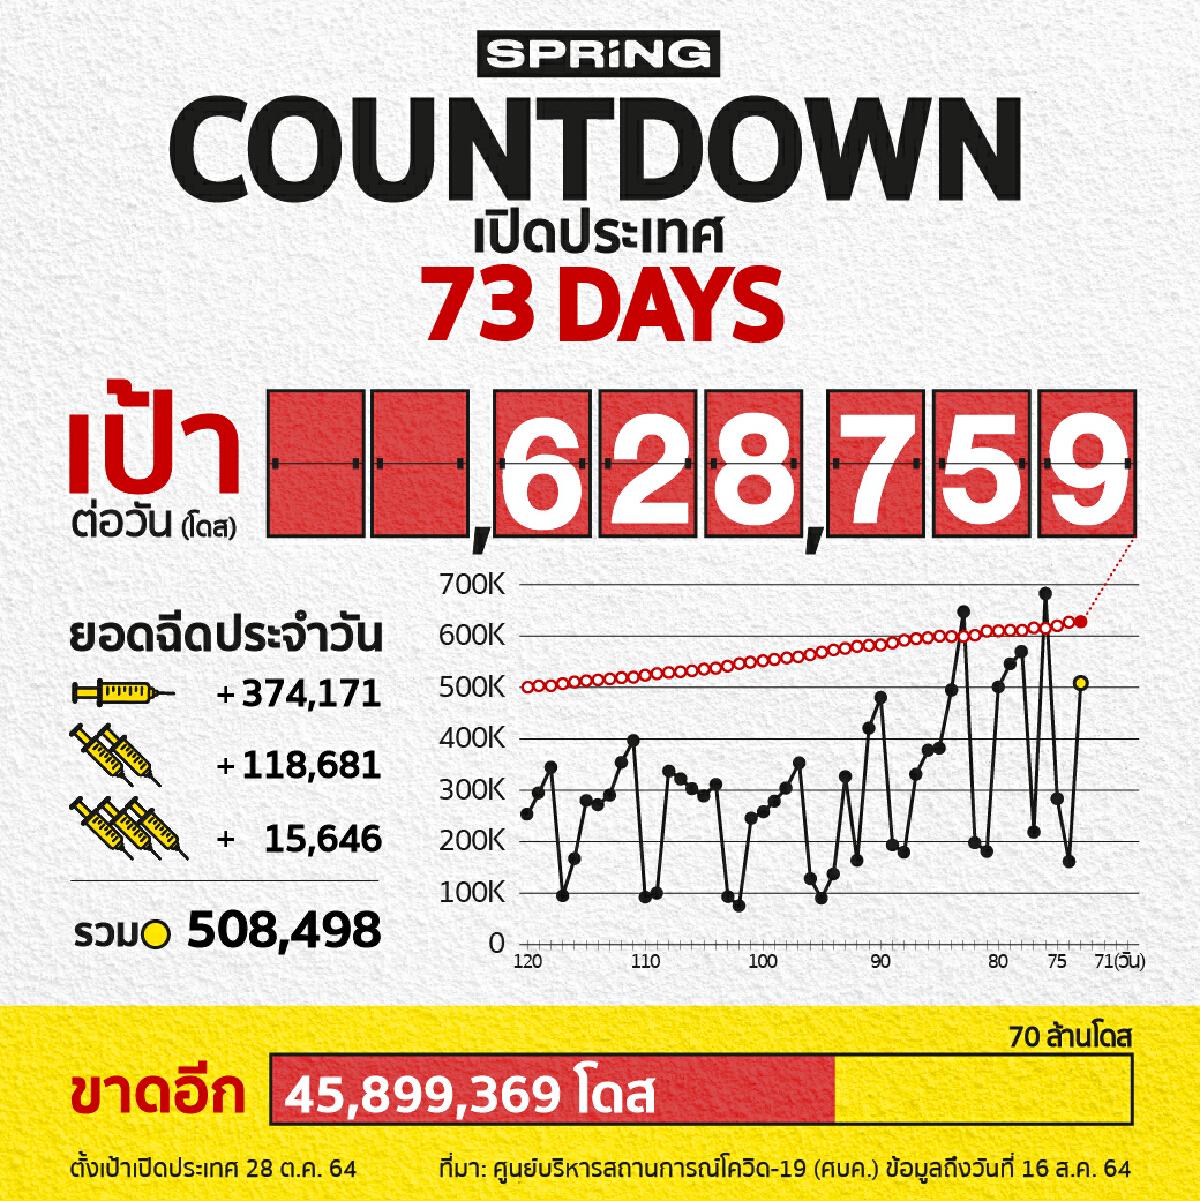 COUNTDOWN! เปิดประเทศใน 73 วัน ฉีดวัคซีนโควิด 508,498 โดส